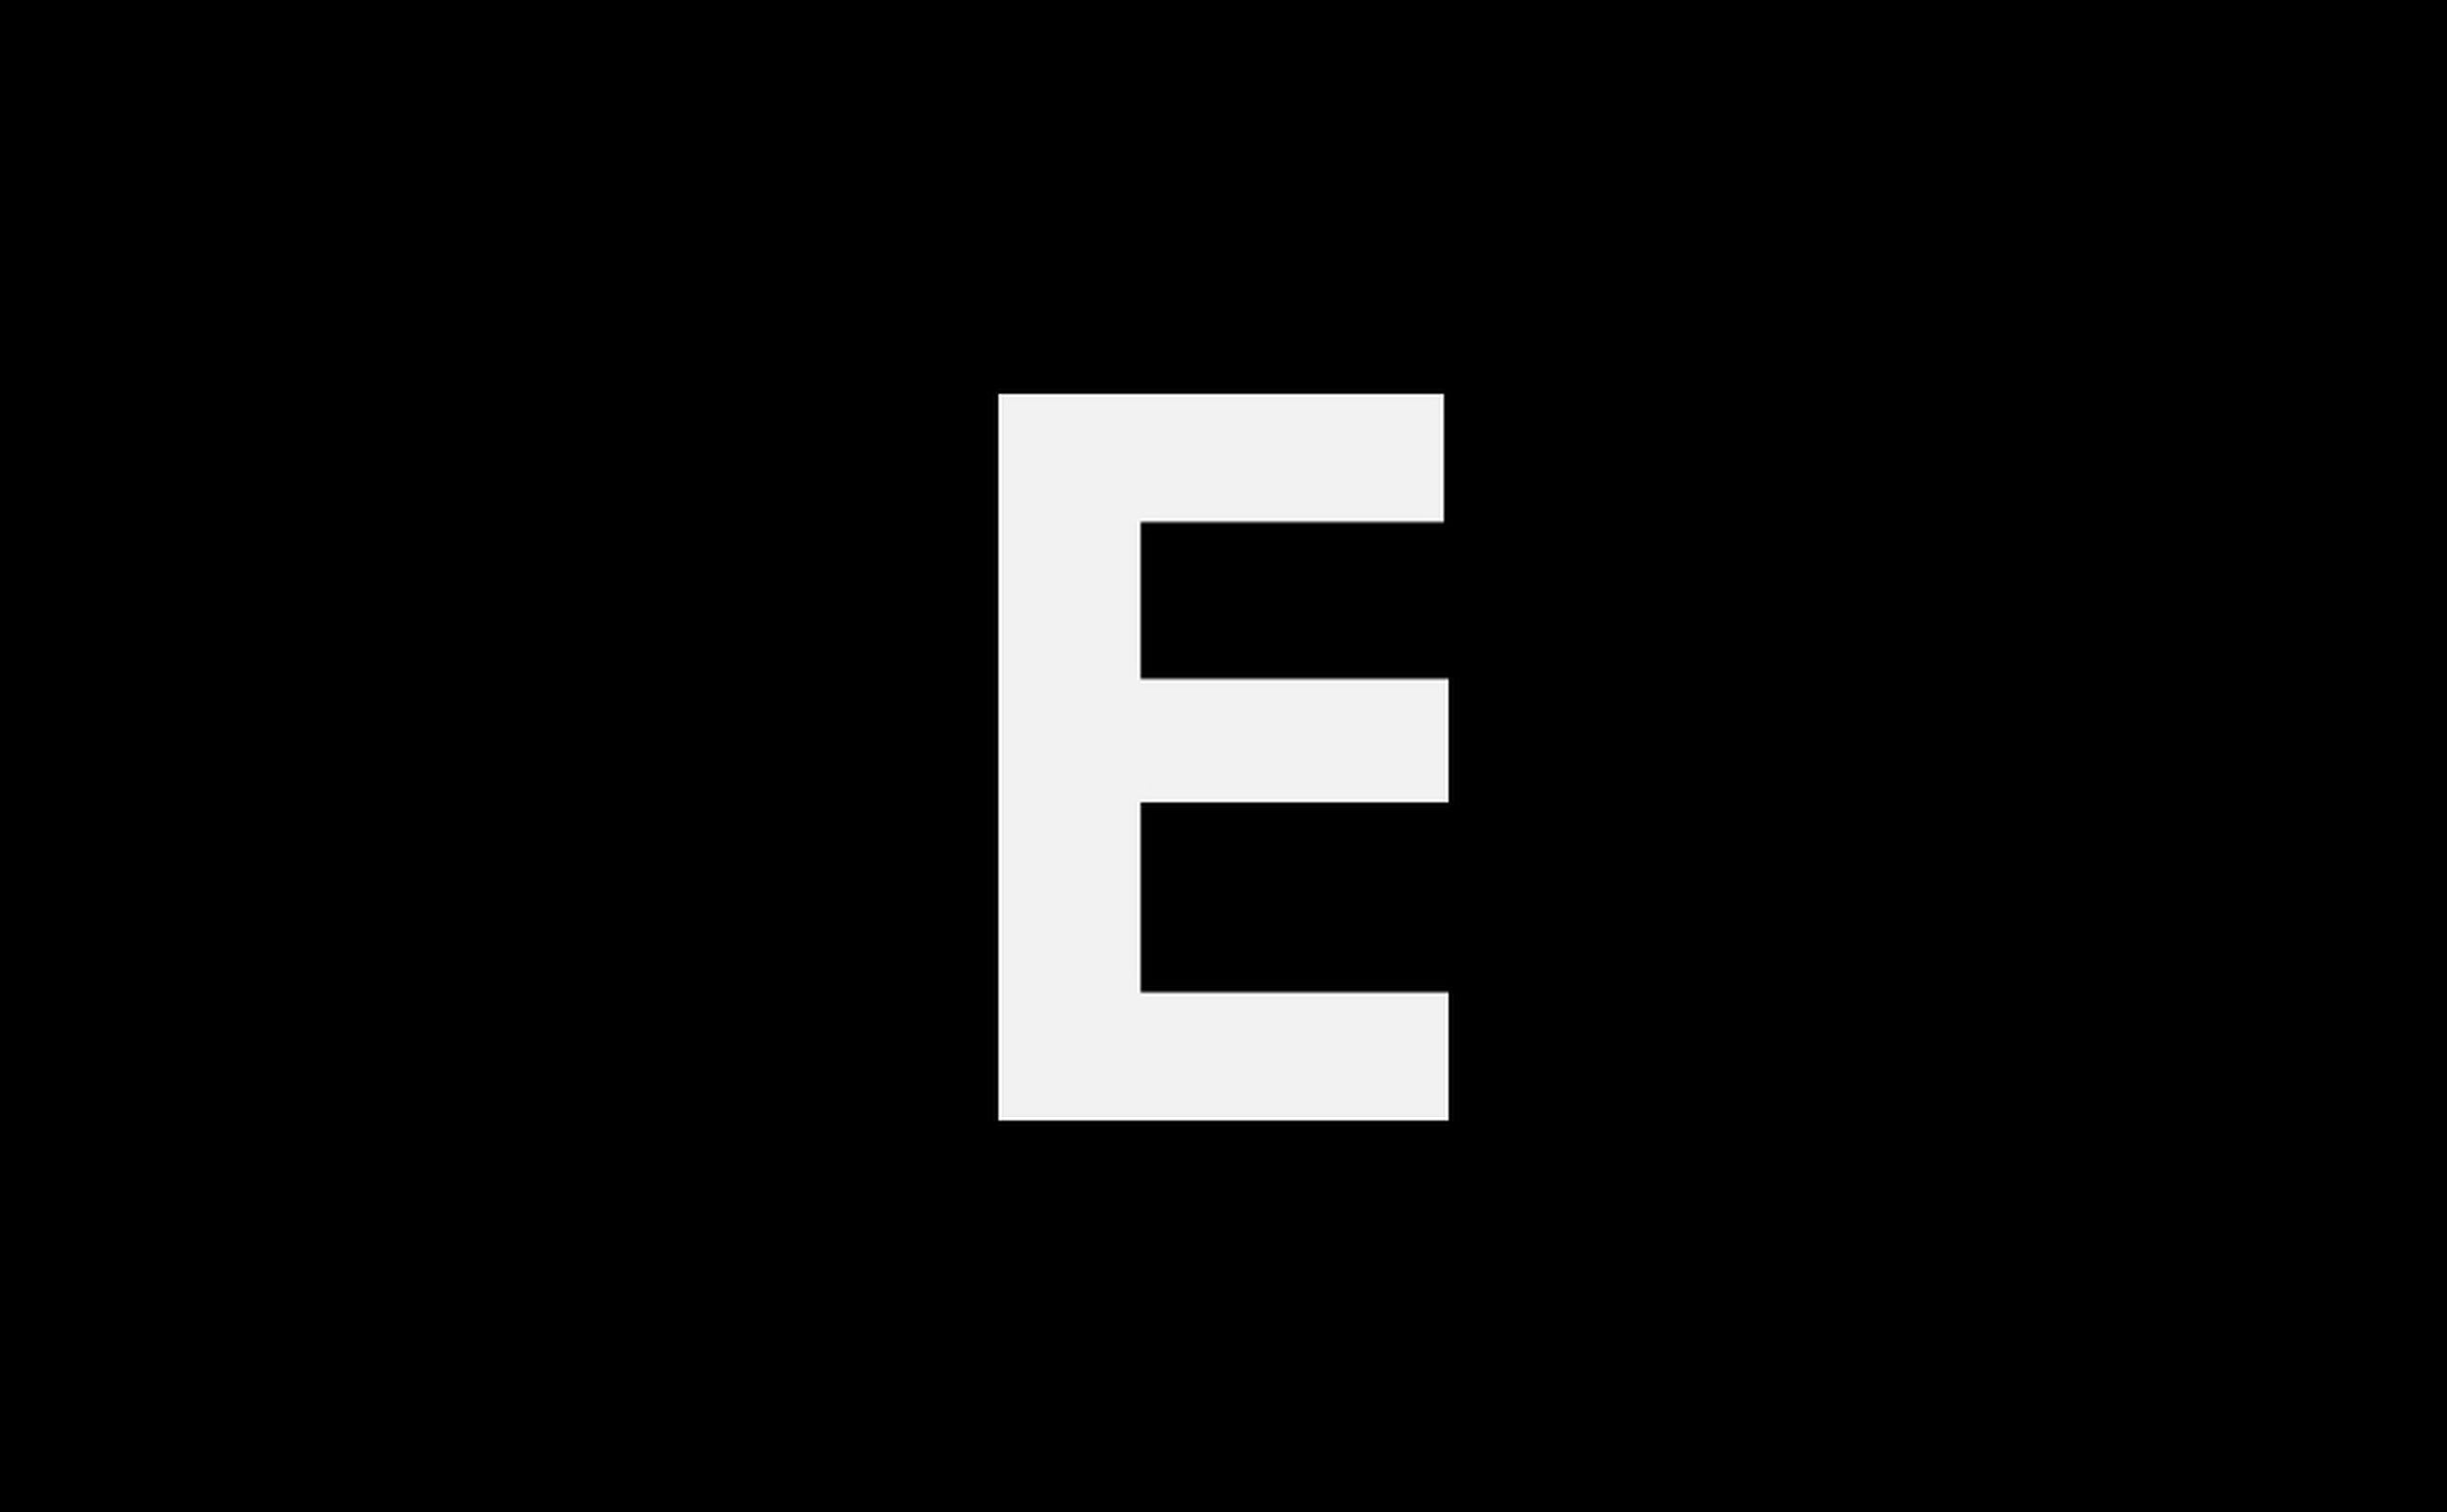 PANORAMIC VIEW OF LAKE AGAINST SKY AT NIGHT